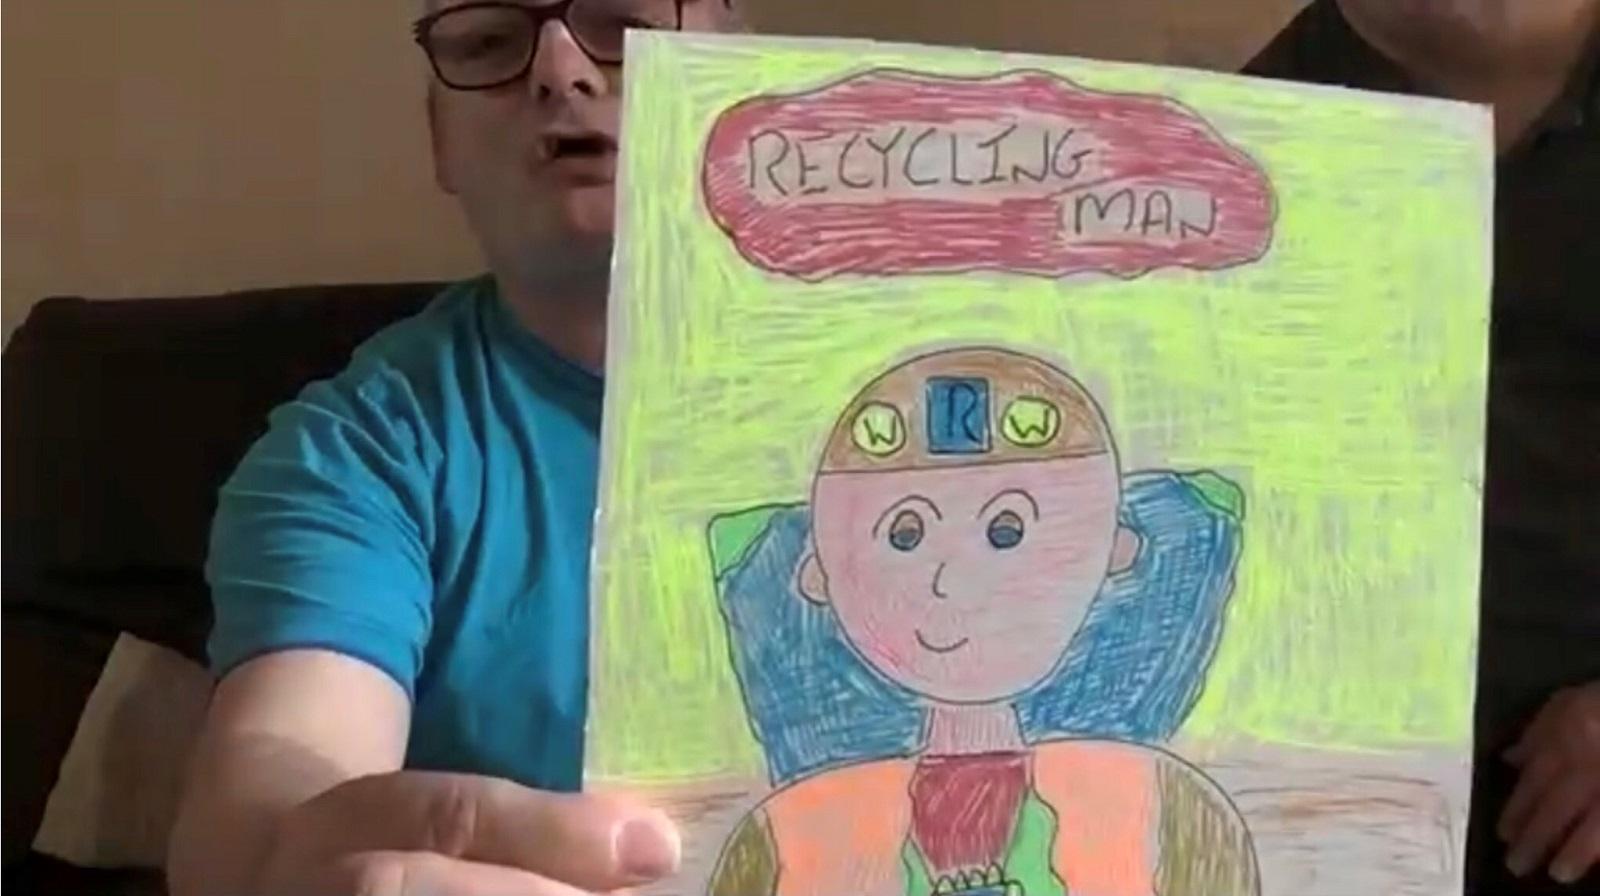 Eric Logan and his new environmentally-friendly superhero, Recycling Man.